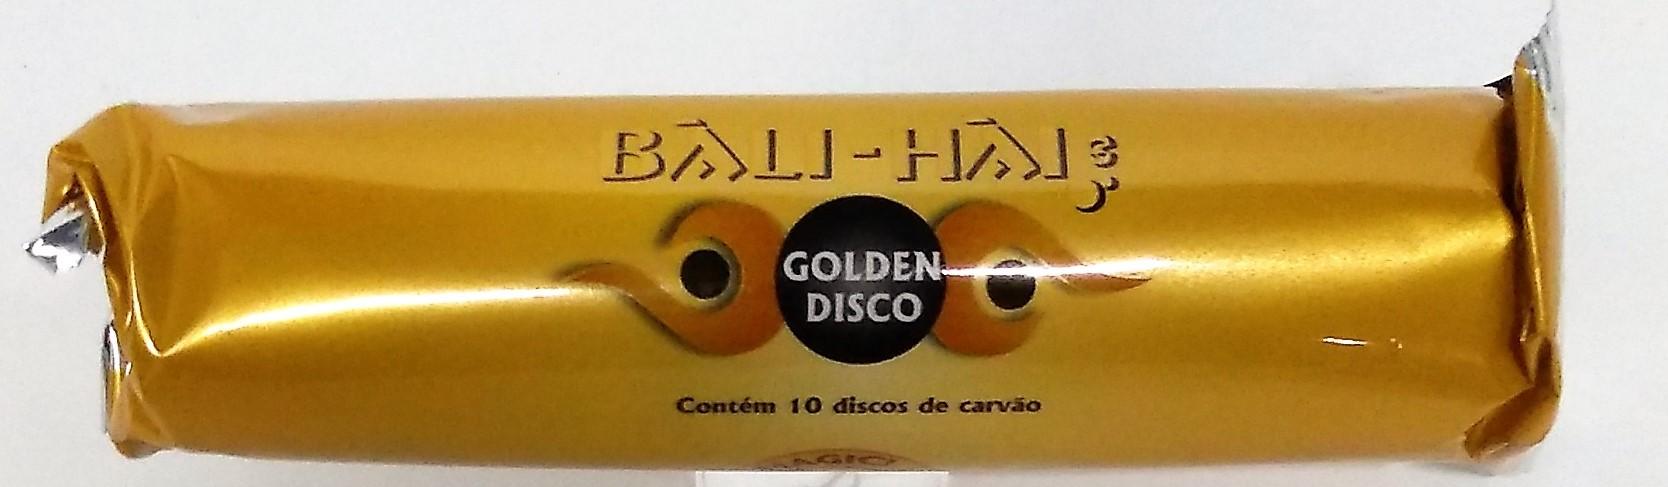 Carvão Bali-Hai Gold